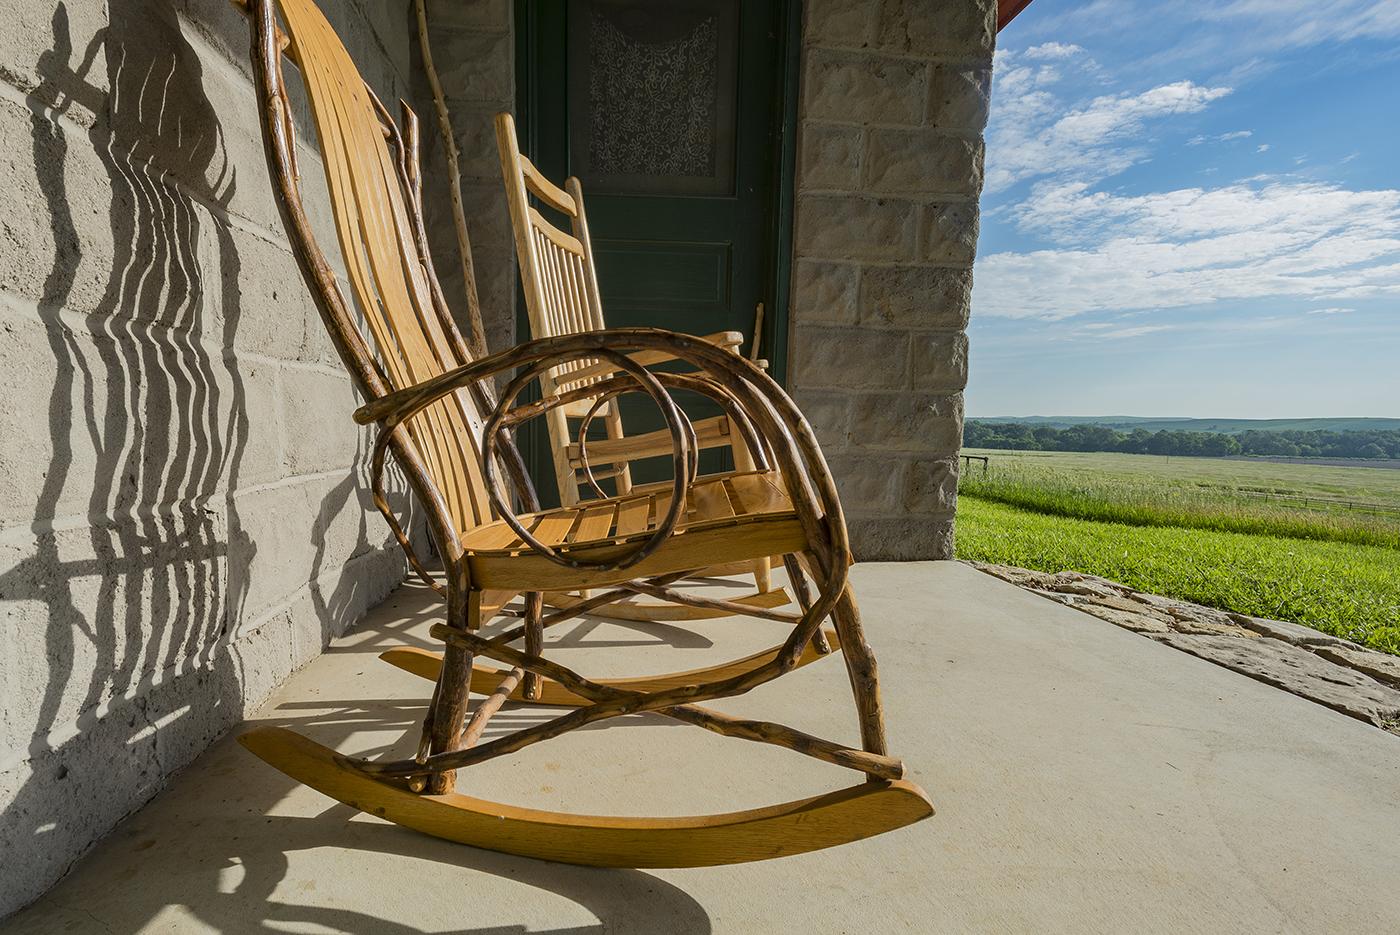 12.   Wooden Chairs in rural Kansas.jpg